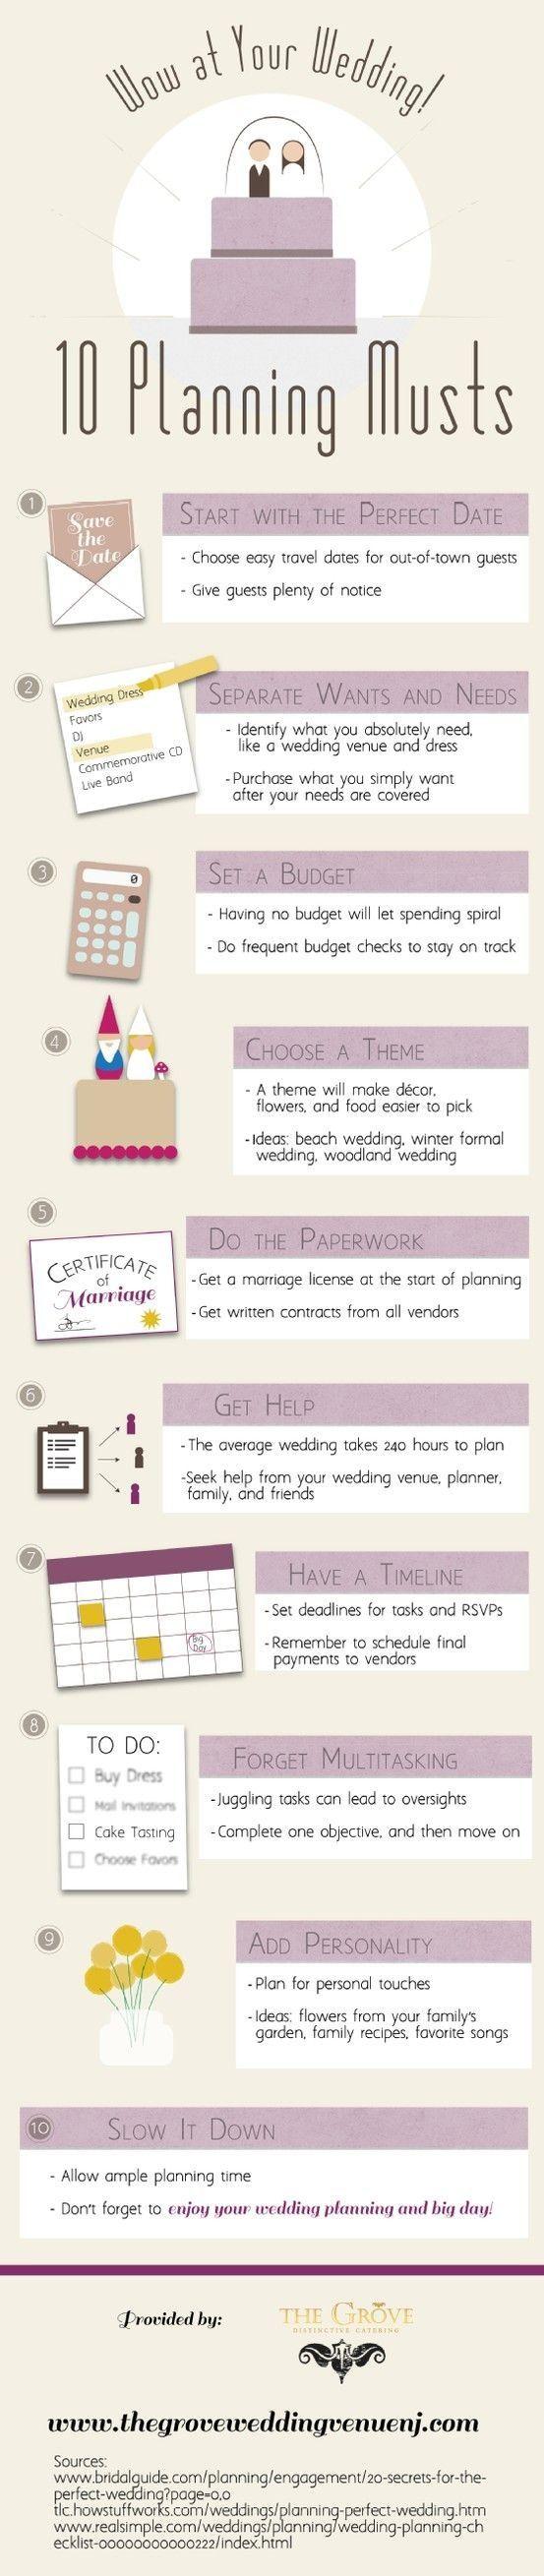 Pes 25 nejlepch npad na tma wedding checklists na pinterestu best wedding planning advice from the pros wedding checklist junglespirit Images